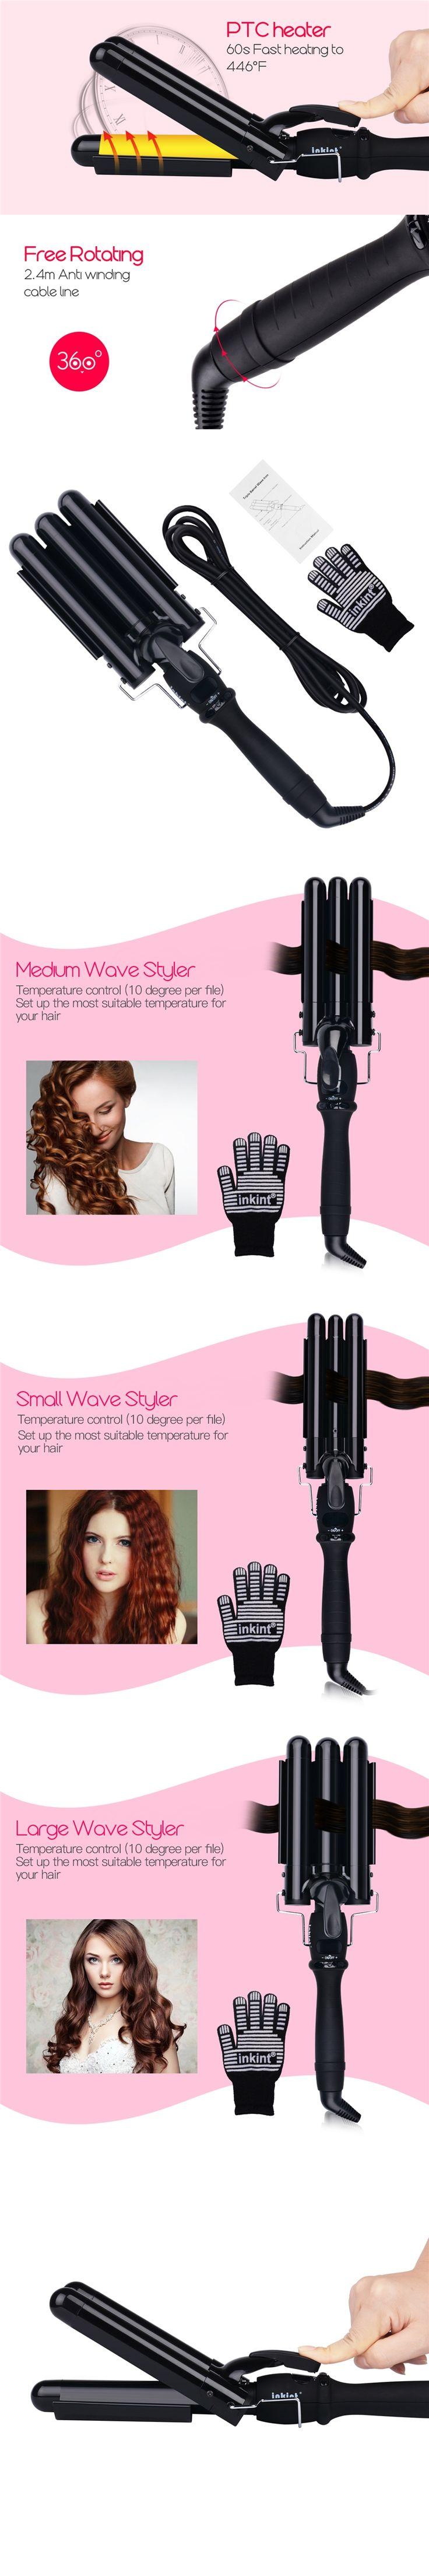 3 size LCD Ceramic Triple Barrels Deep Wave Crimper Hair Curler Waver Electric Curling Iron Salon Anion Curls Hair Styler Tool 0